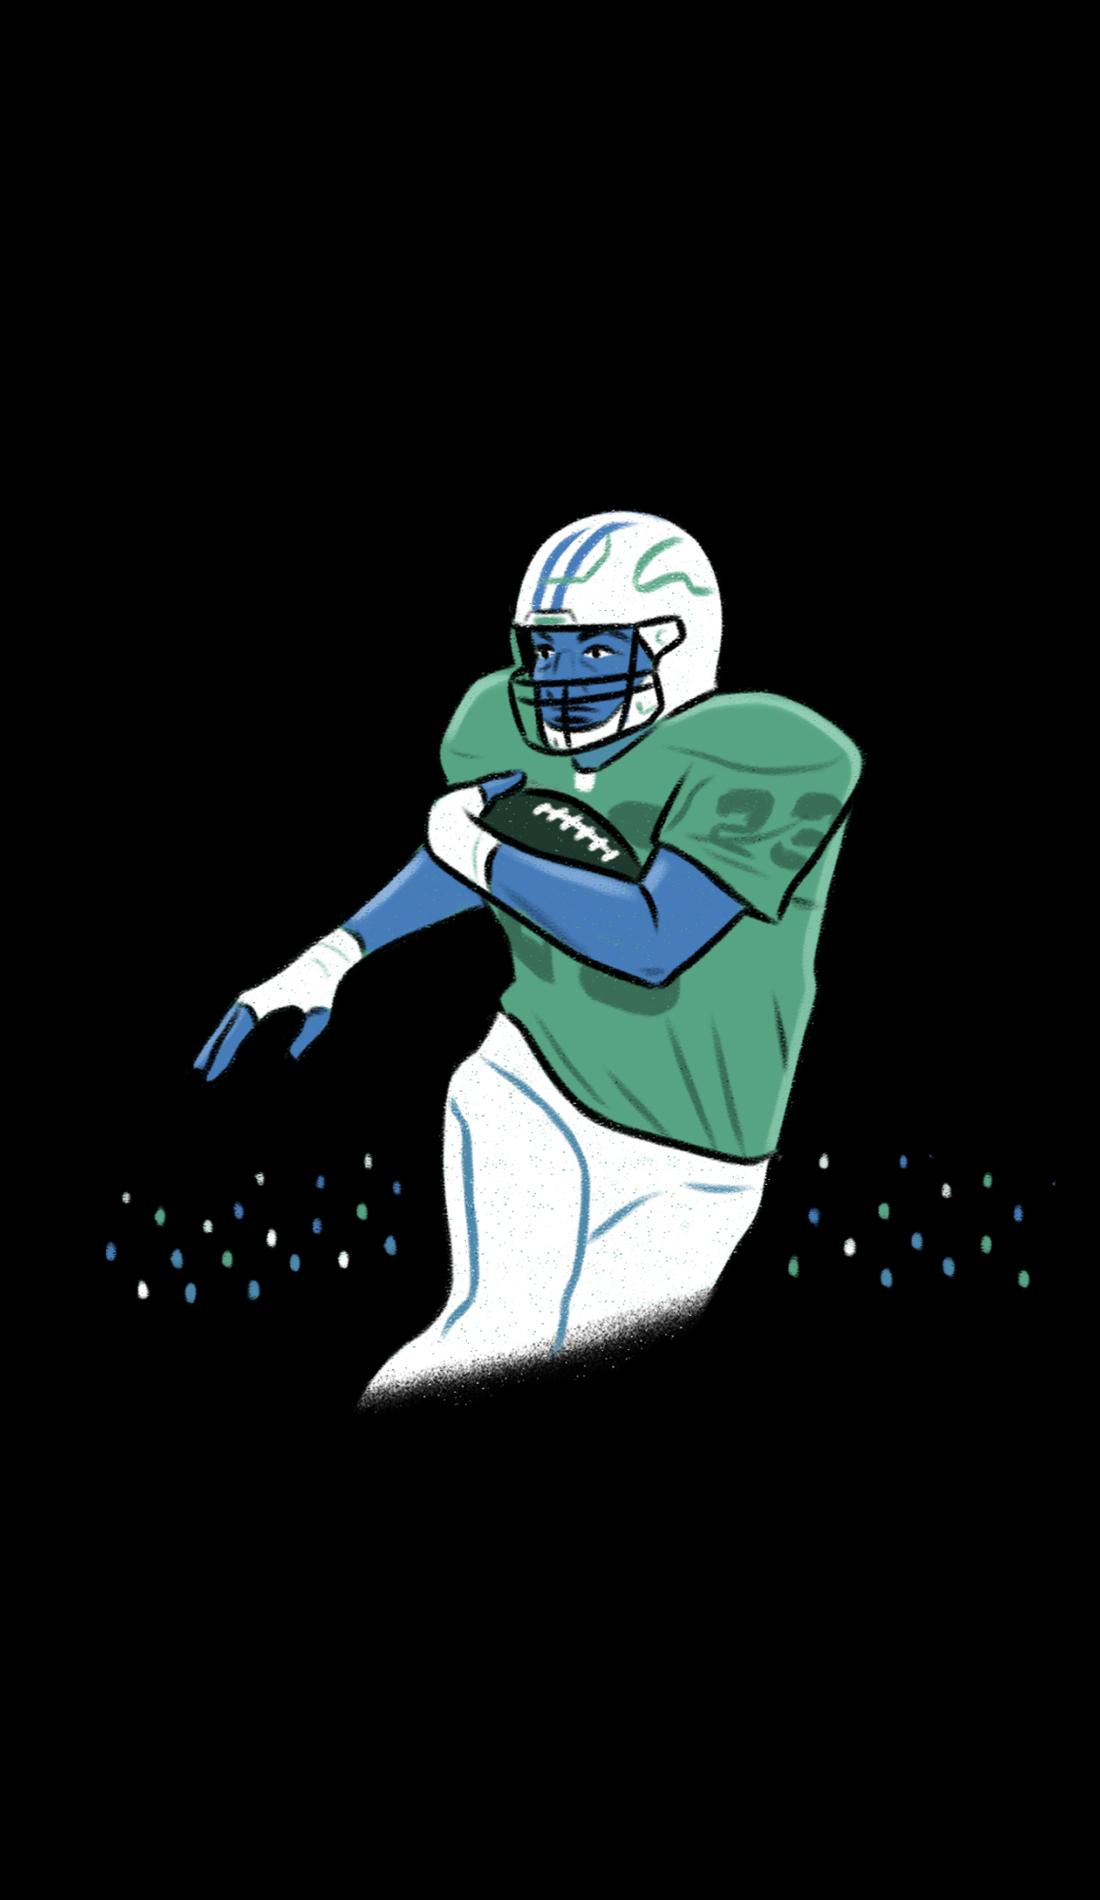 A North Alabama Lions Football live event